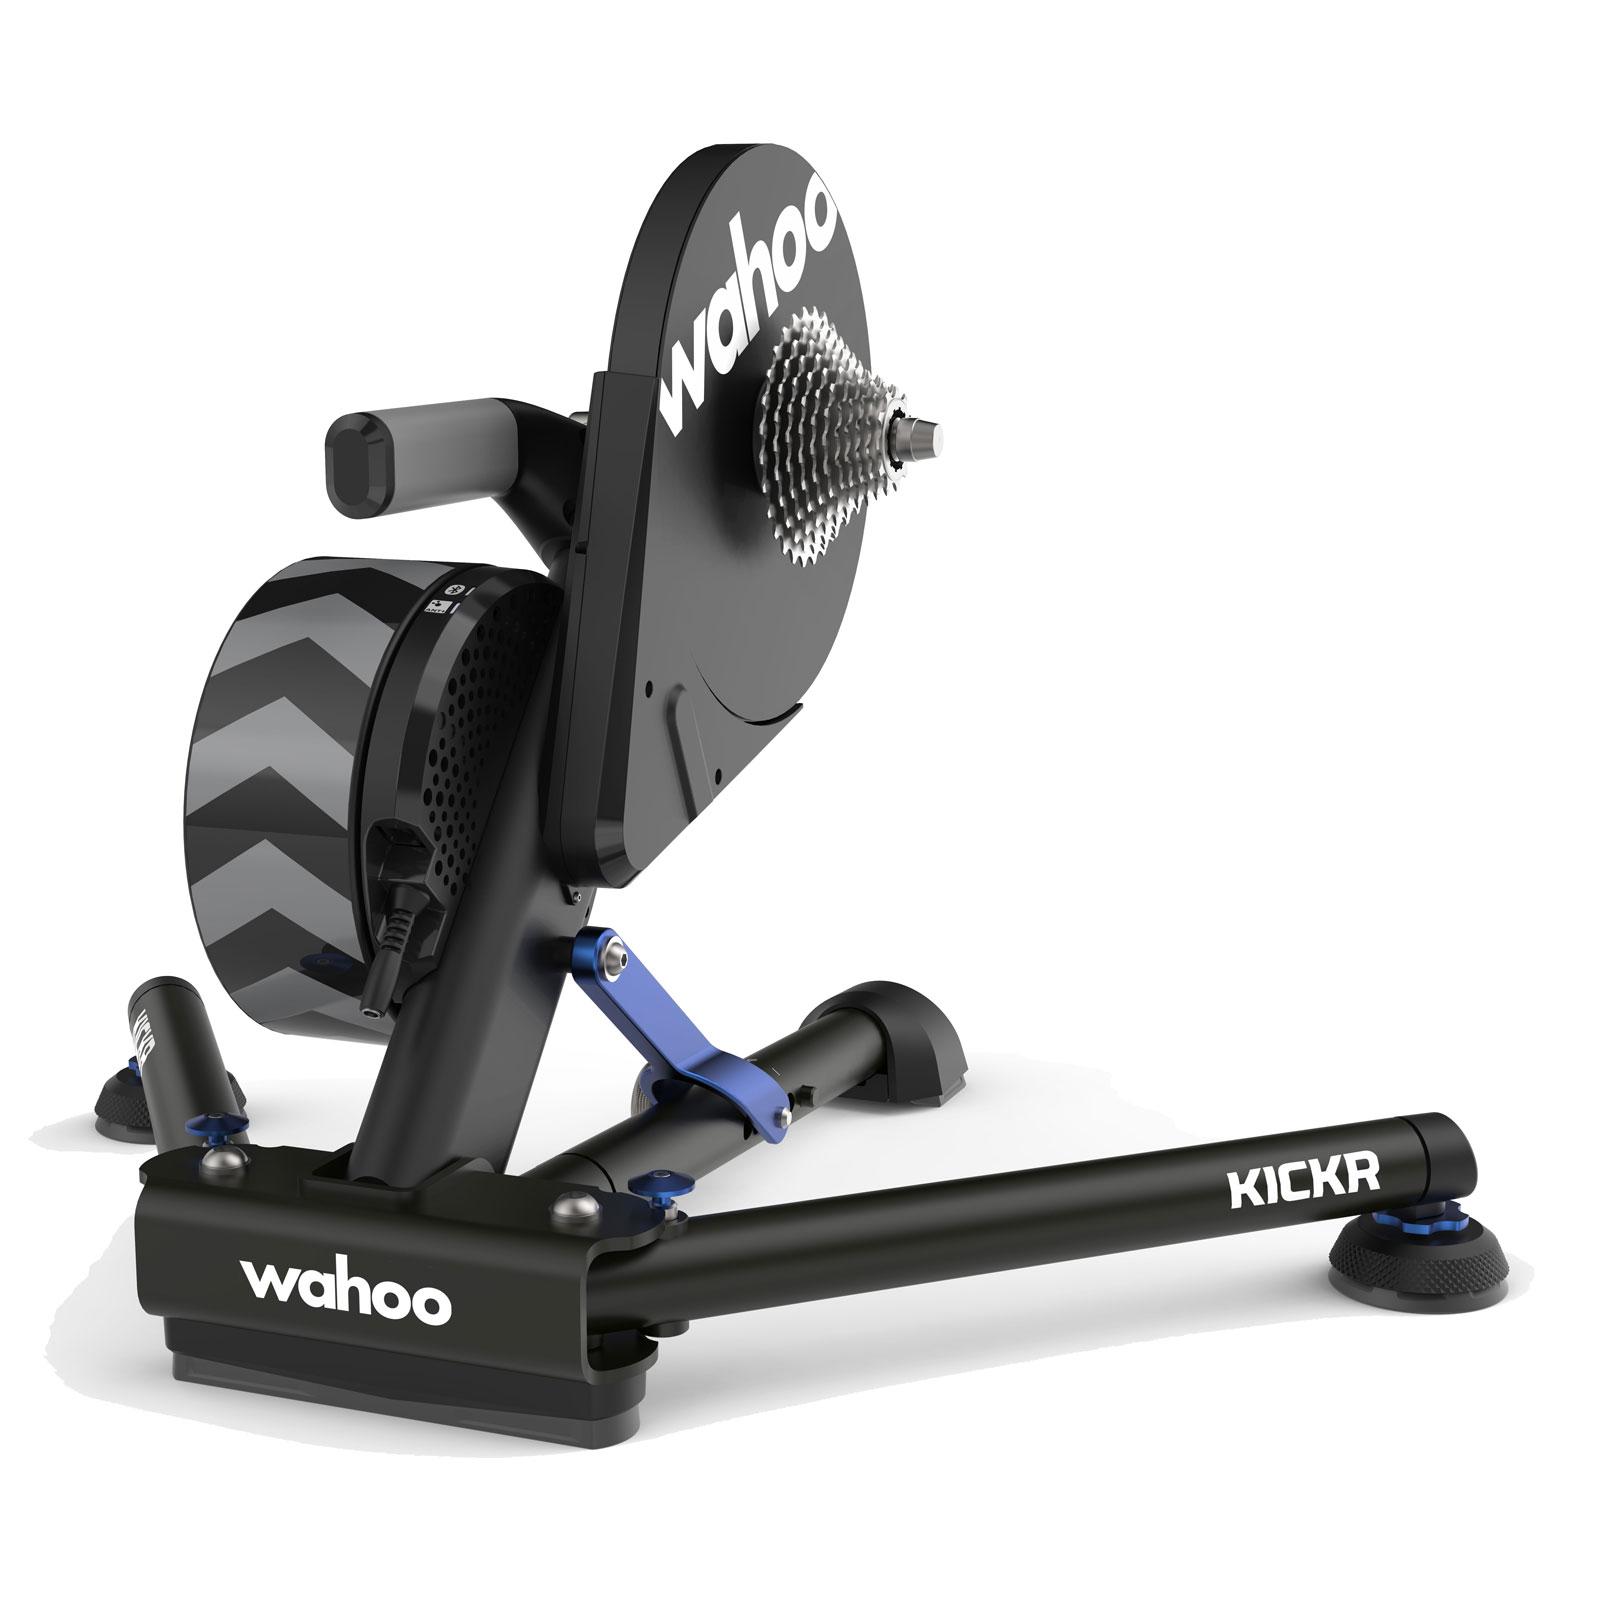 Wahoo KICKR v5 Smart Bike Trainer